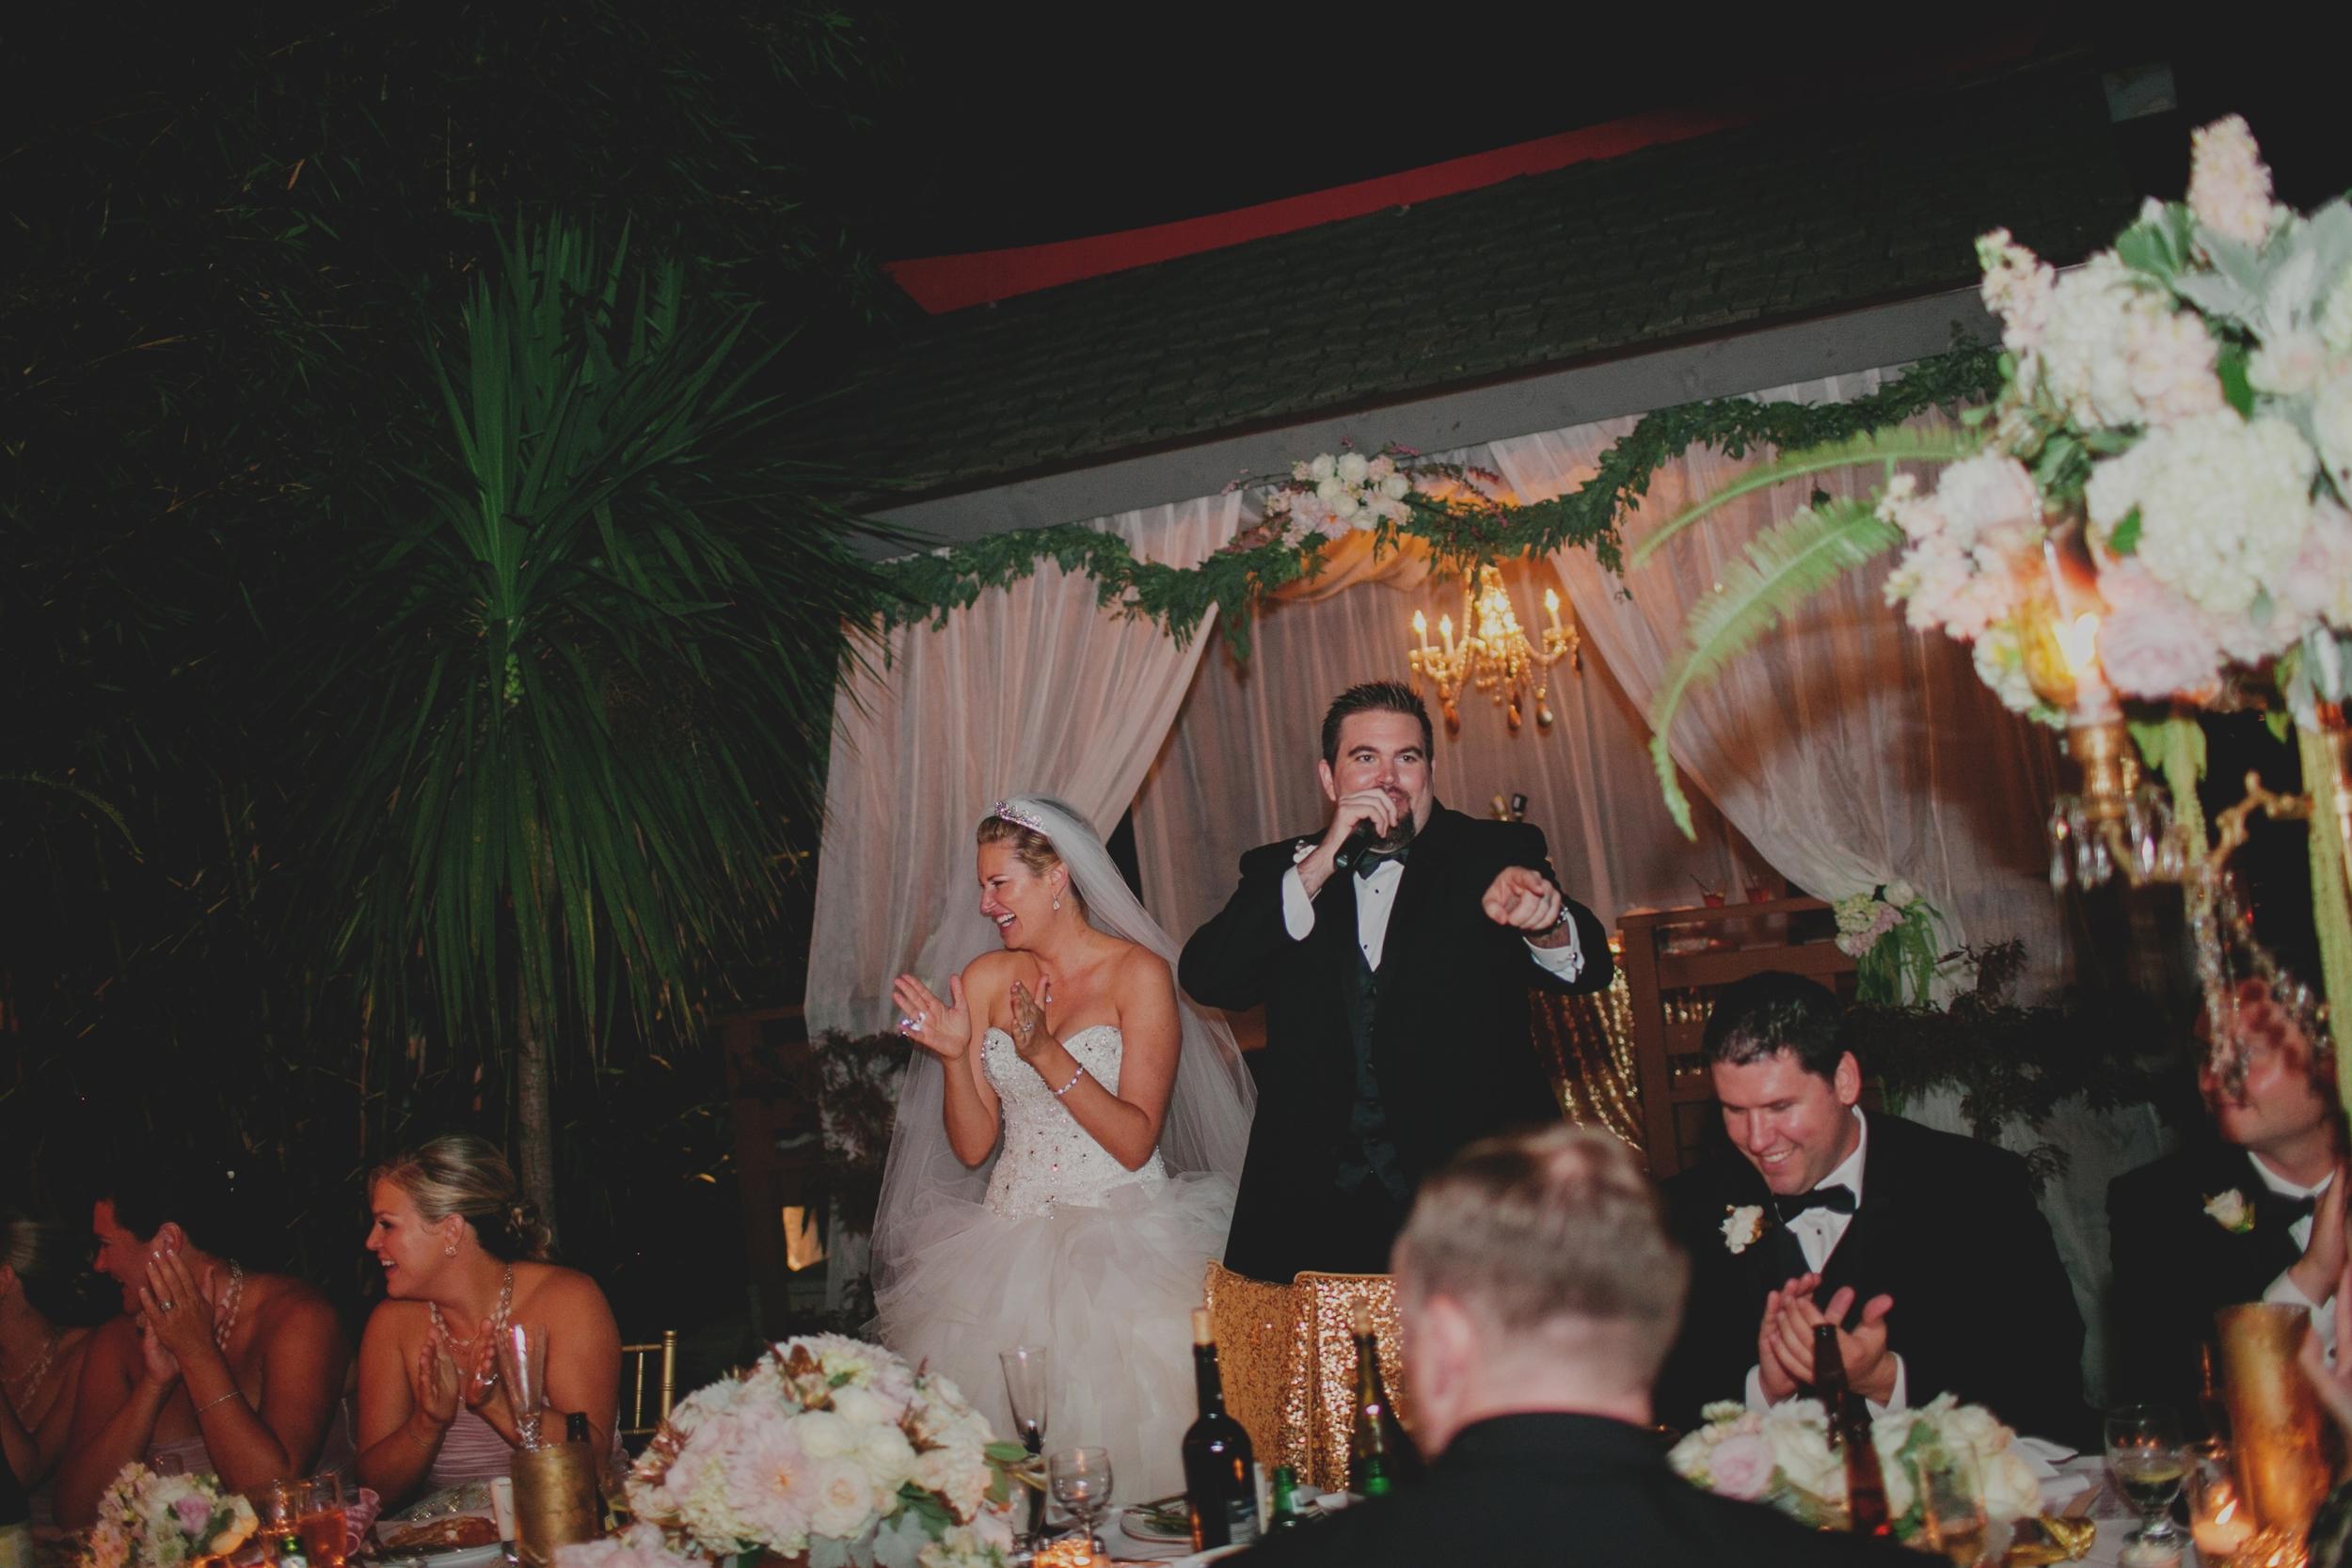 The-Suitcase-Studio-Timree-Matt-Lifestyle-Wedding-Photographer-100.jpg